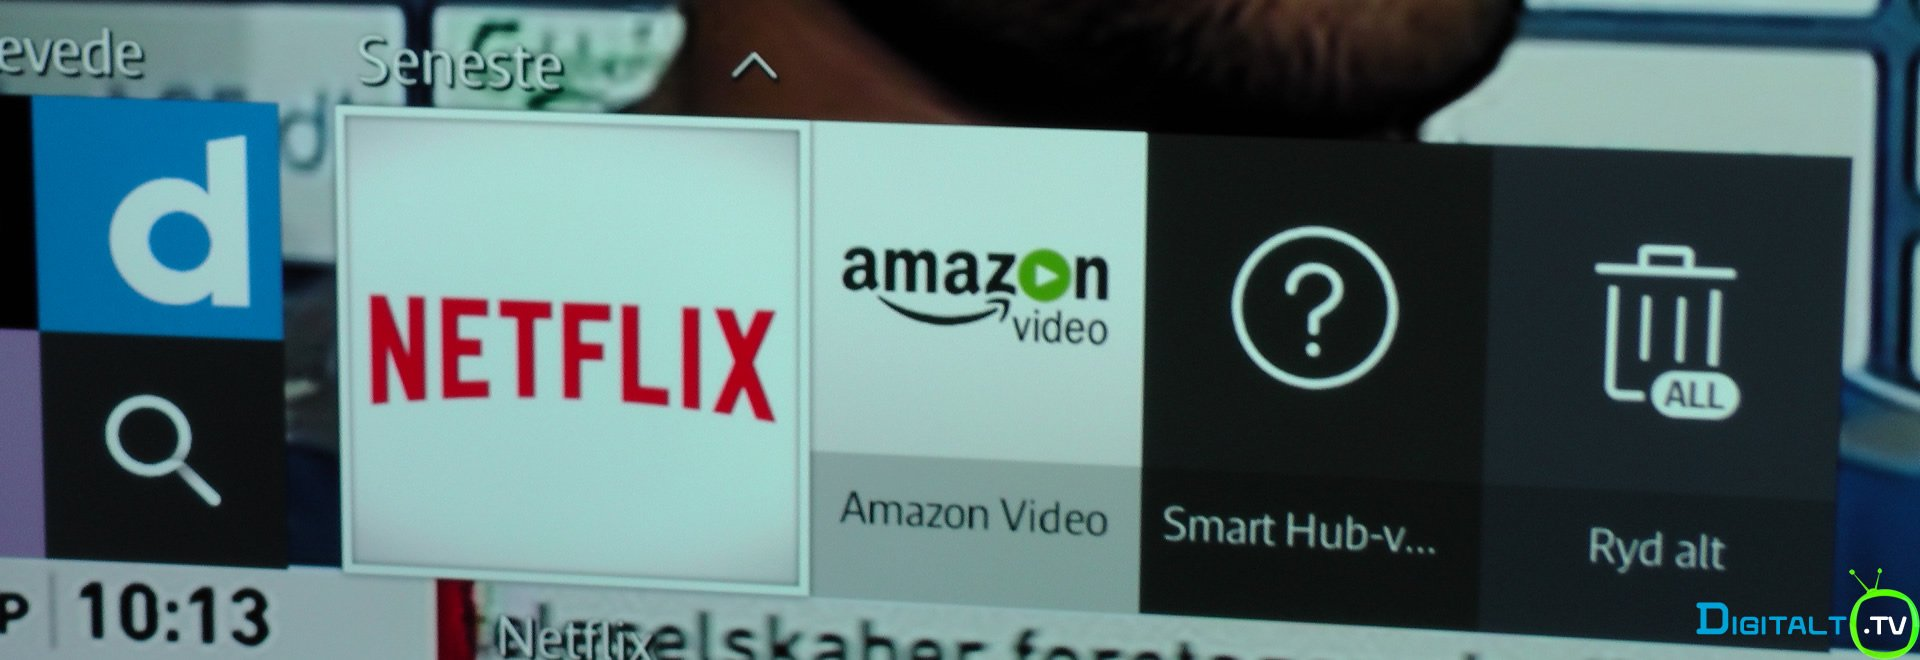 Amazon Samsung Tizen Smart TV menu